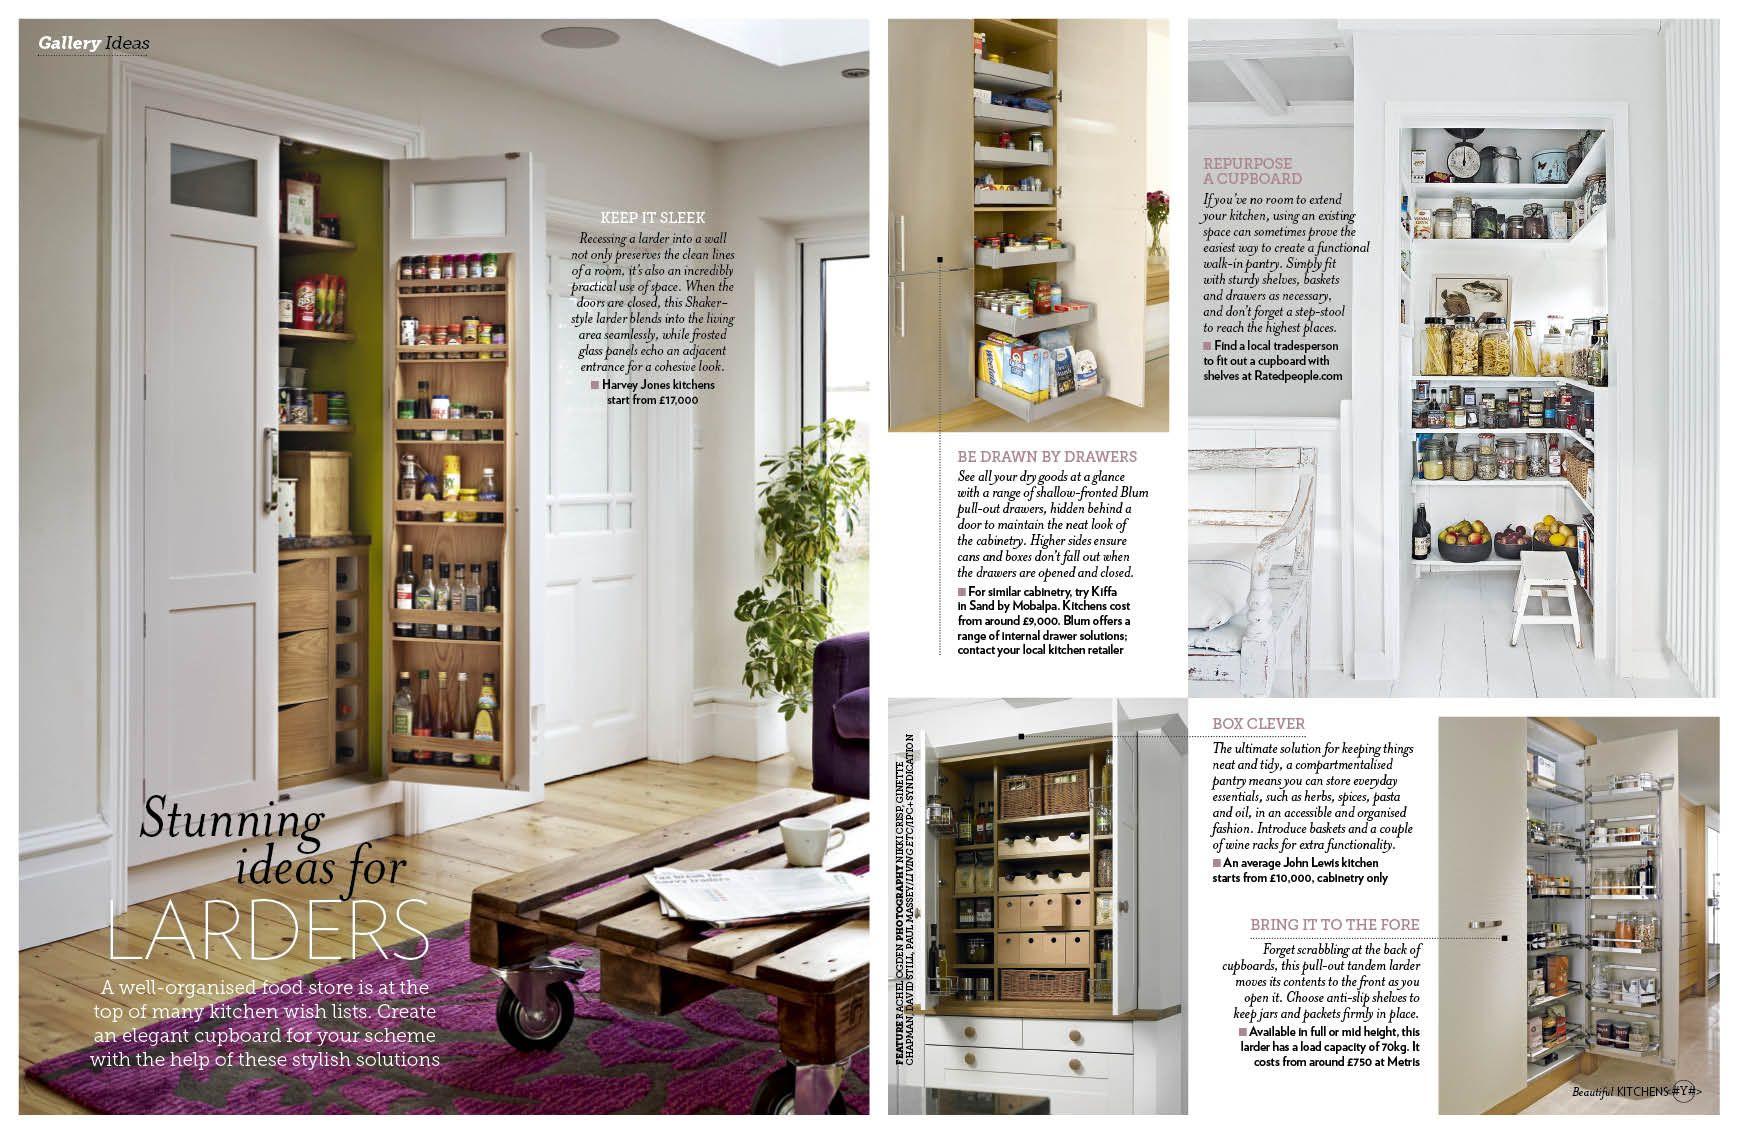 Ideas for larders | For the Home | Pinterest | Larder cupboard ...